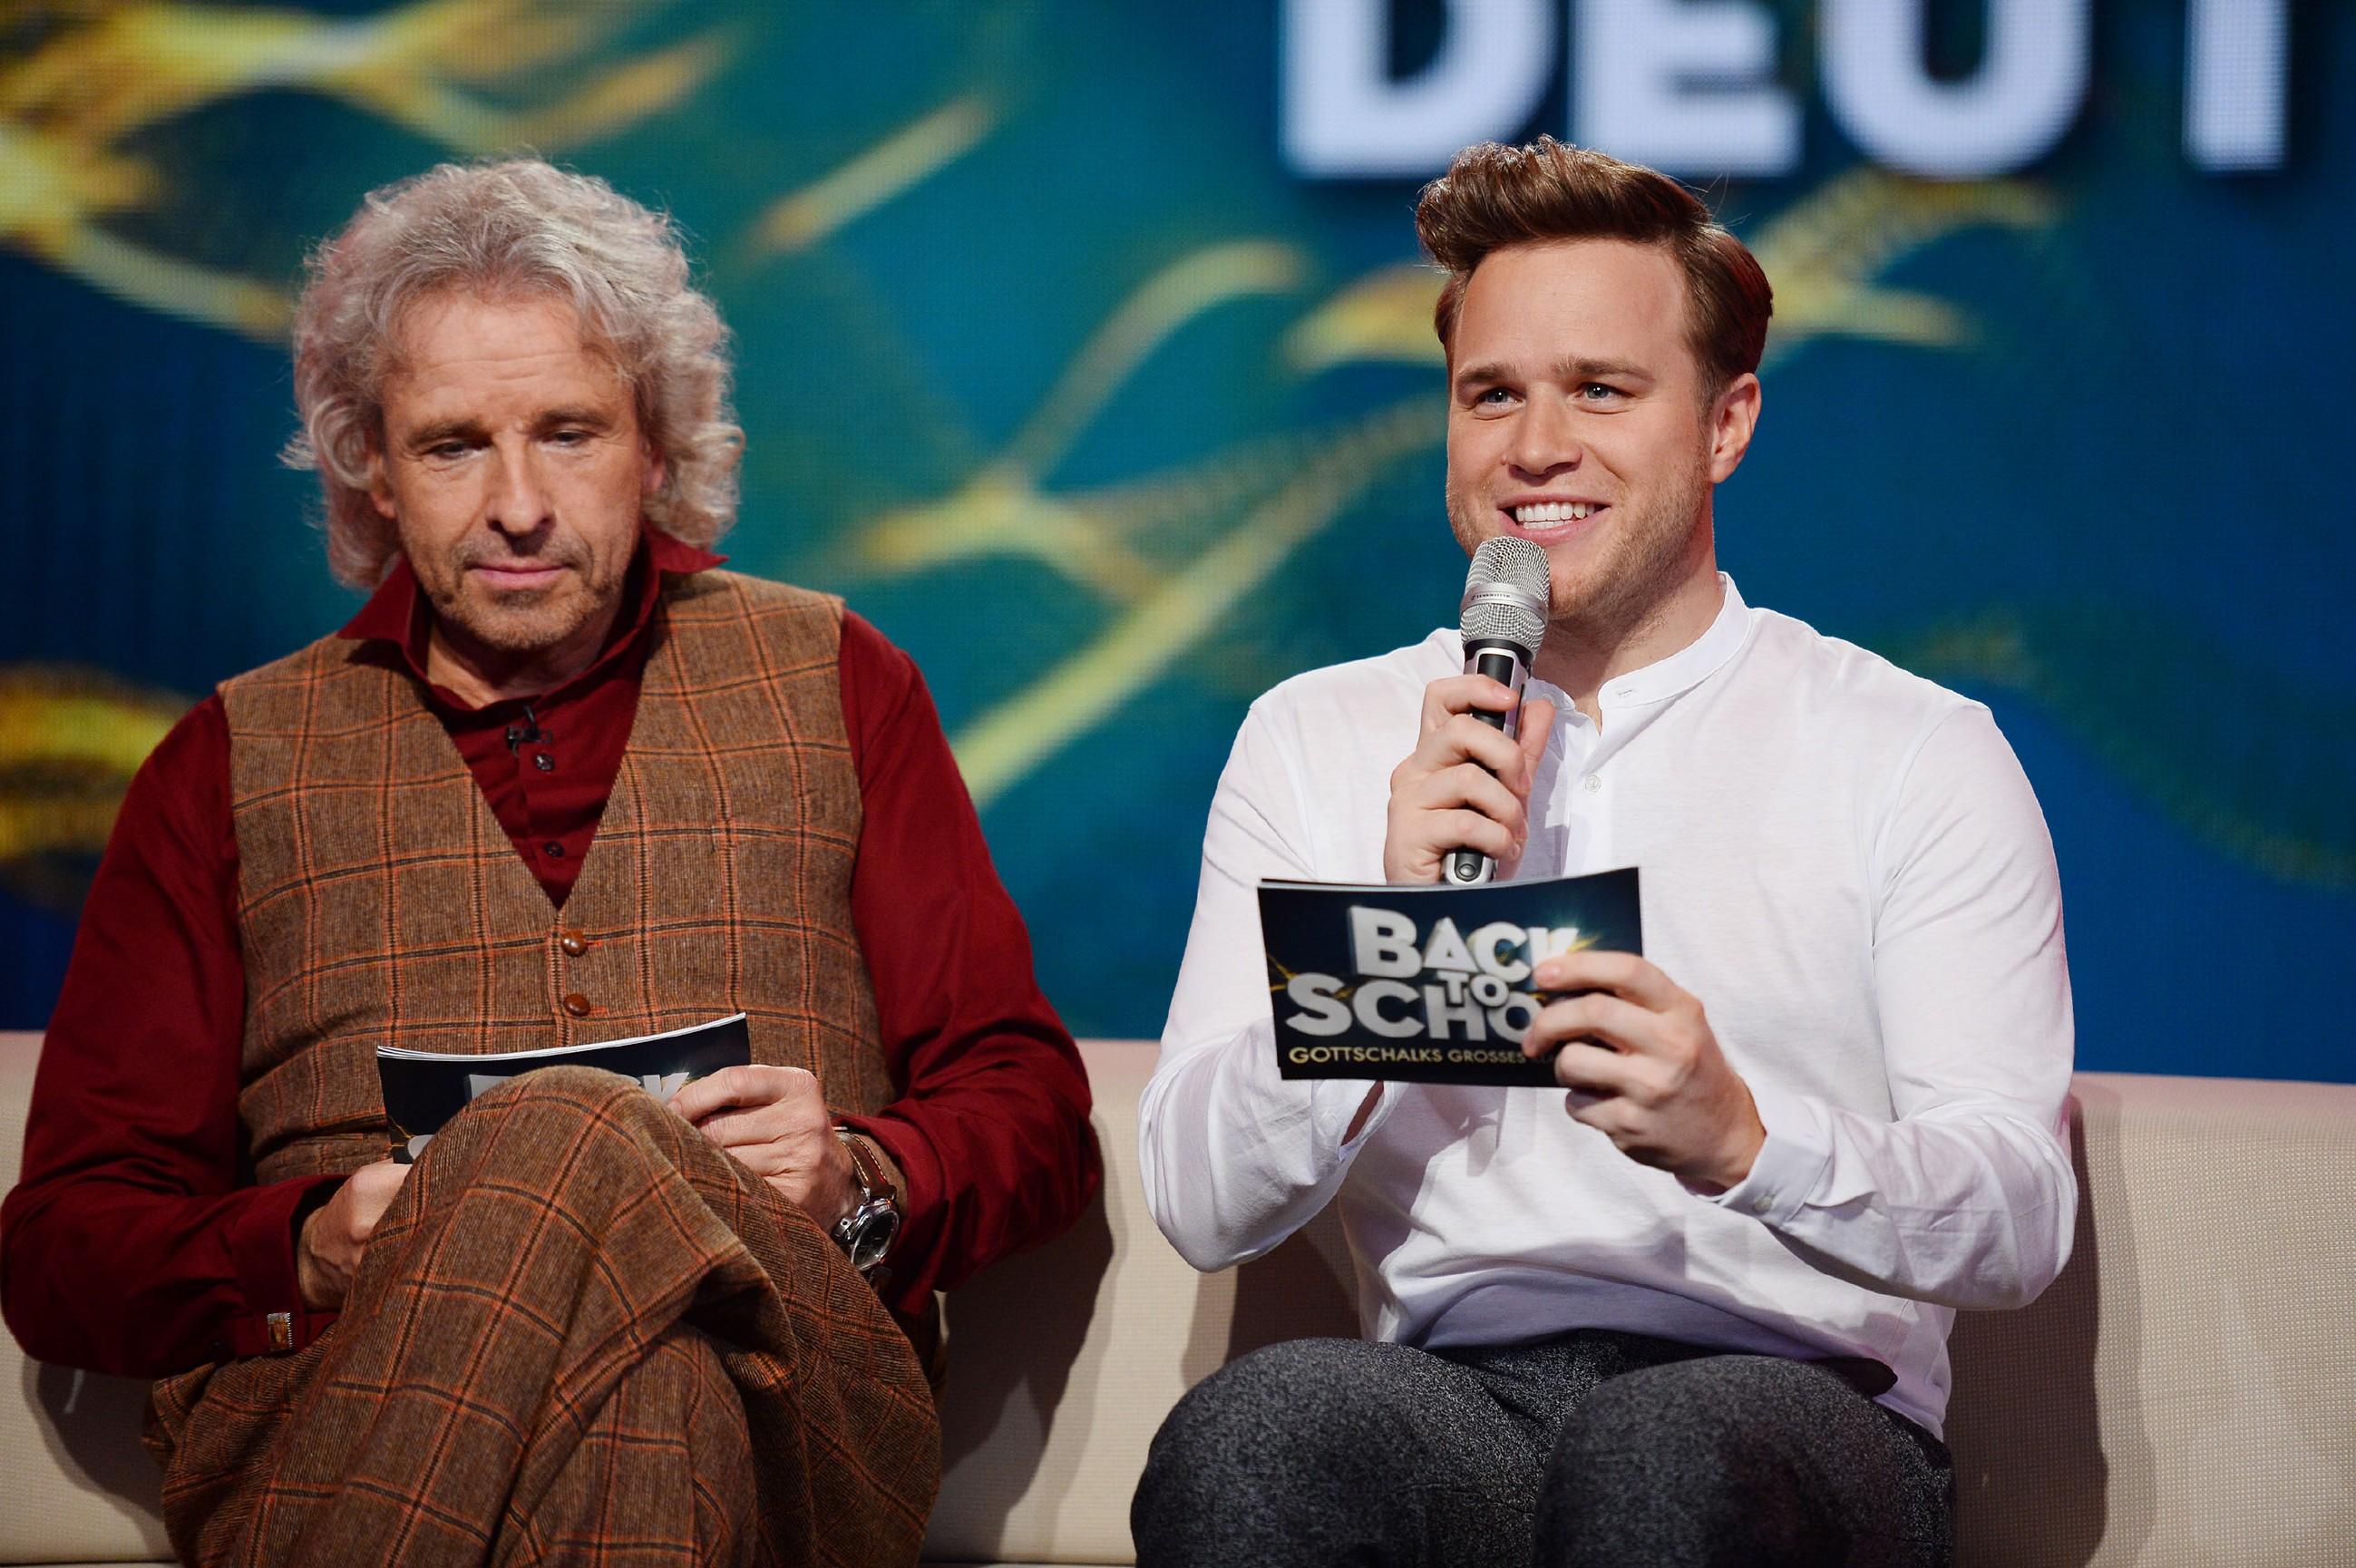 Back To School Thomas Gottschalk Und Olly Murs Stars On Tv